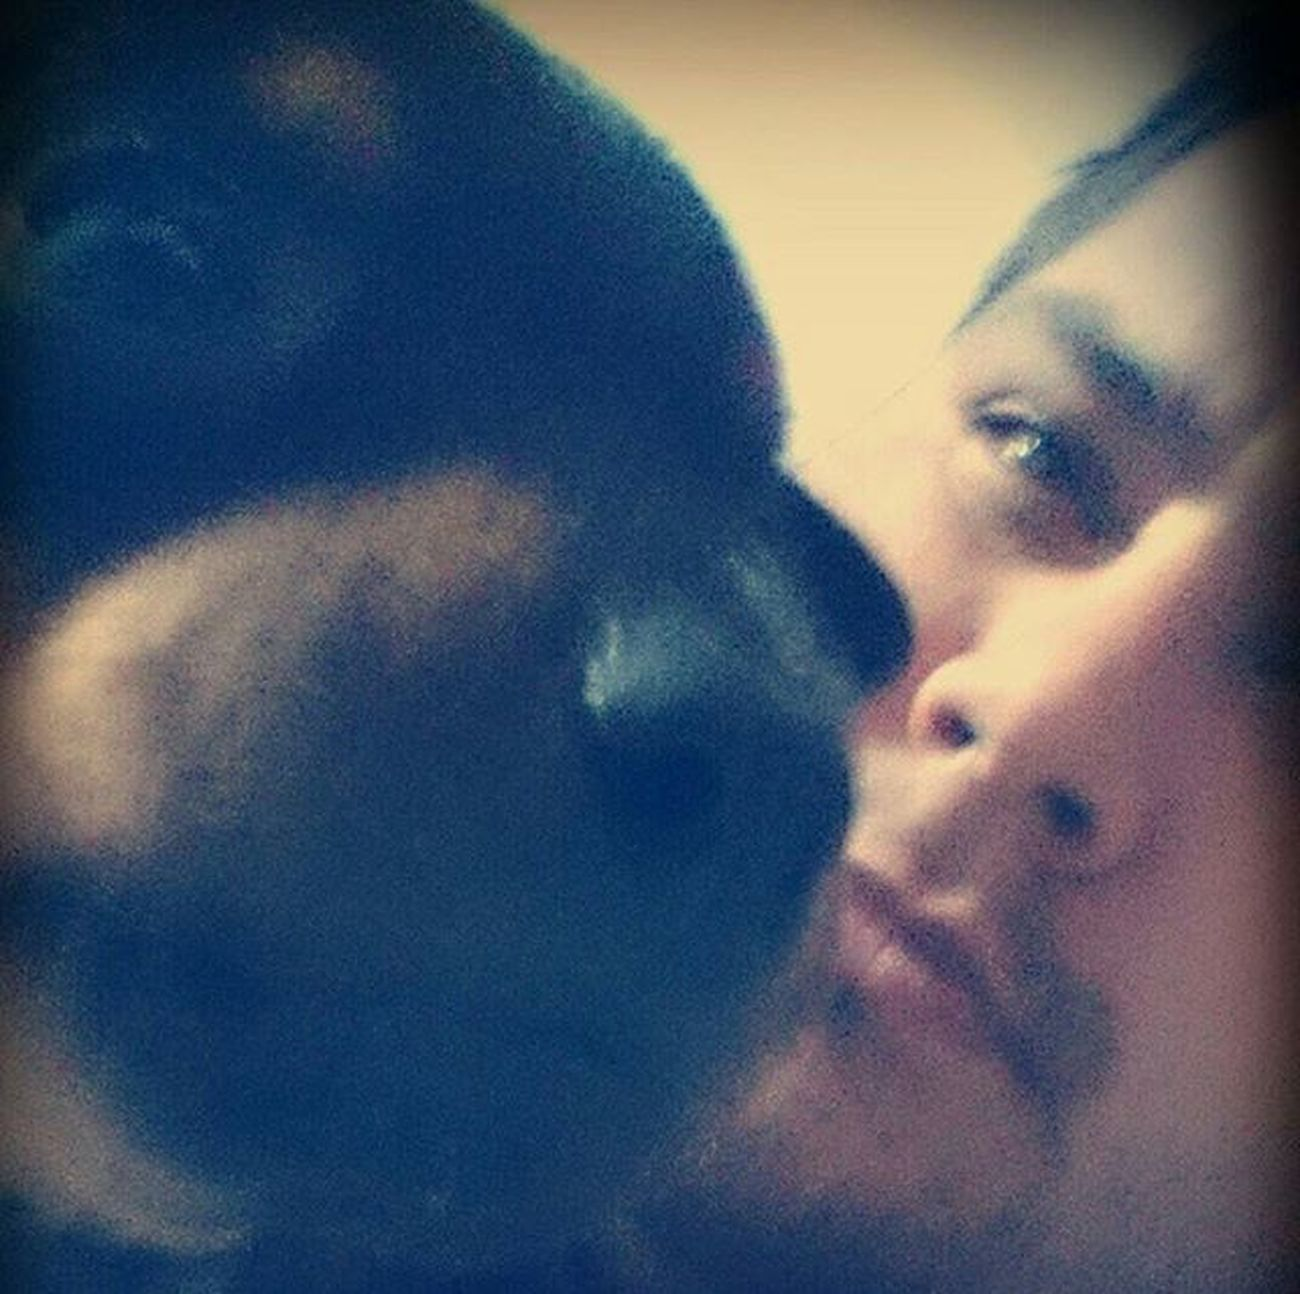 Absolut Malena... Fotografia Selfie Pinscher Dobermampinscher Perro Mascota Animales Chic Malėna Yo FotoDelDia 😚 😚 Aburrido Formosa CmteFontana 😚 😚 Momentos Miradas Pasandoelrato Comandantefontana Formoseño Formoseñeando pueblo minipinscher